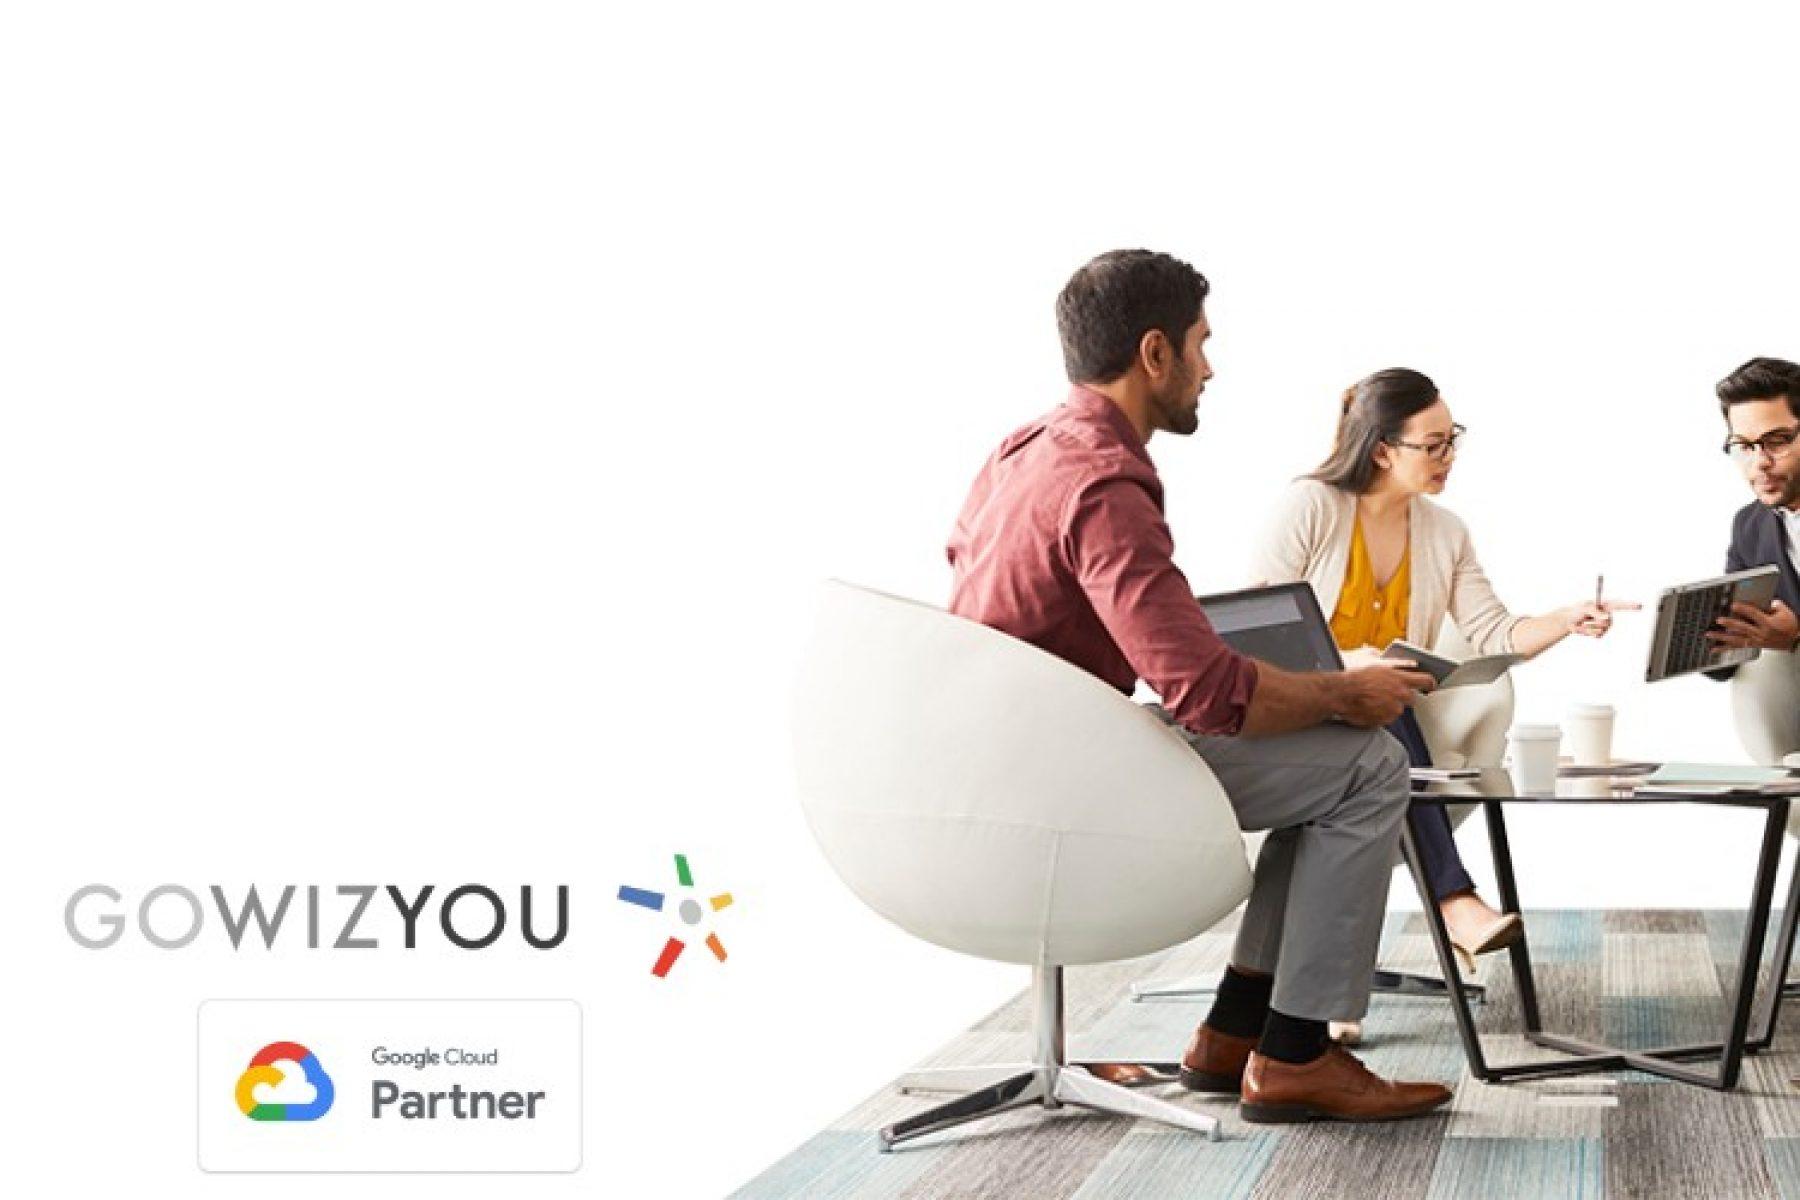 Gowizyou Google Cloud Partner